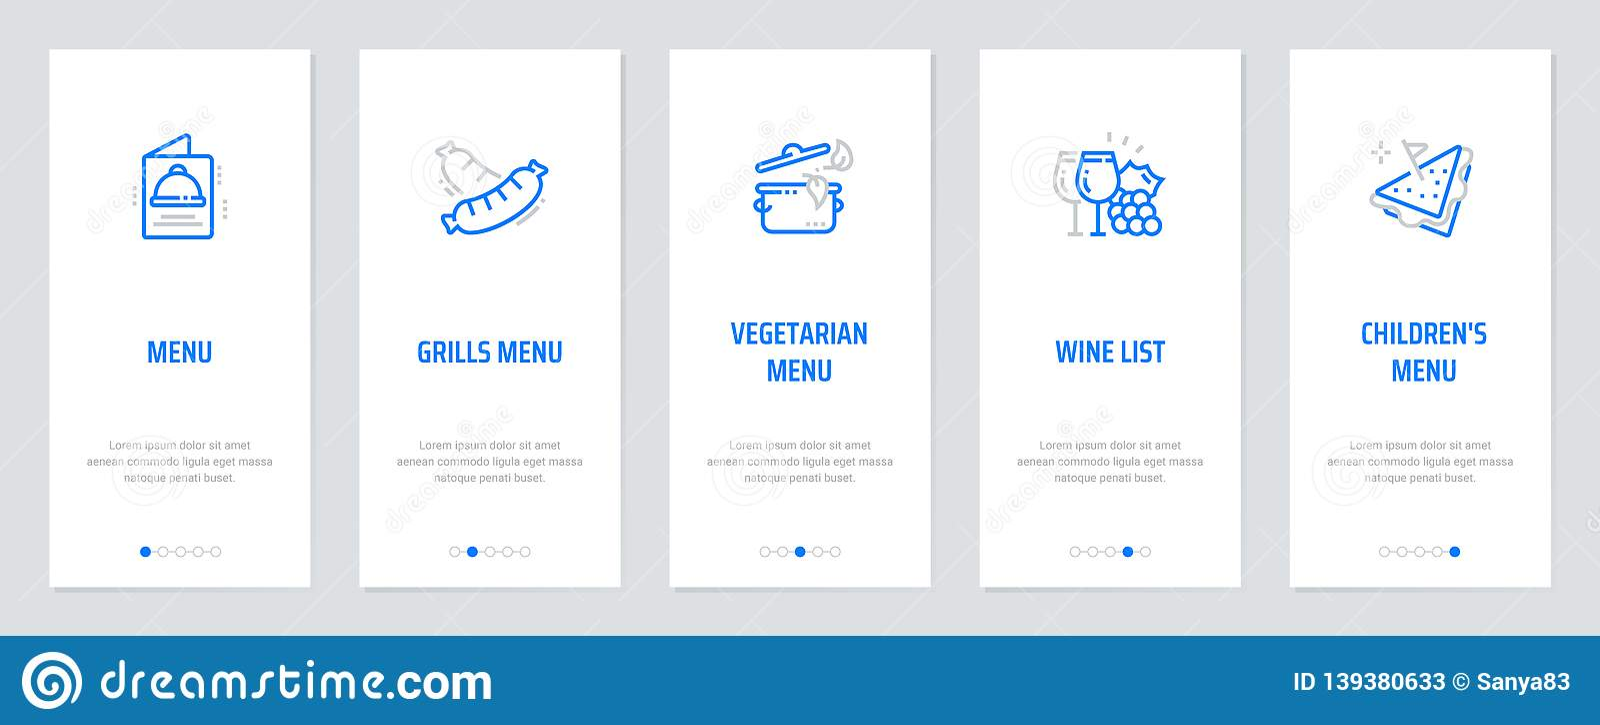 Menu, Grills Menu, Vegetarian Menu, Wine List, Children`s